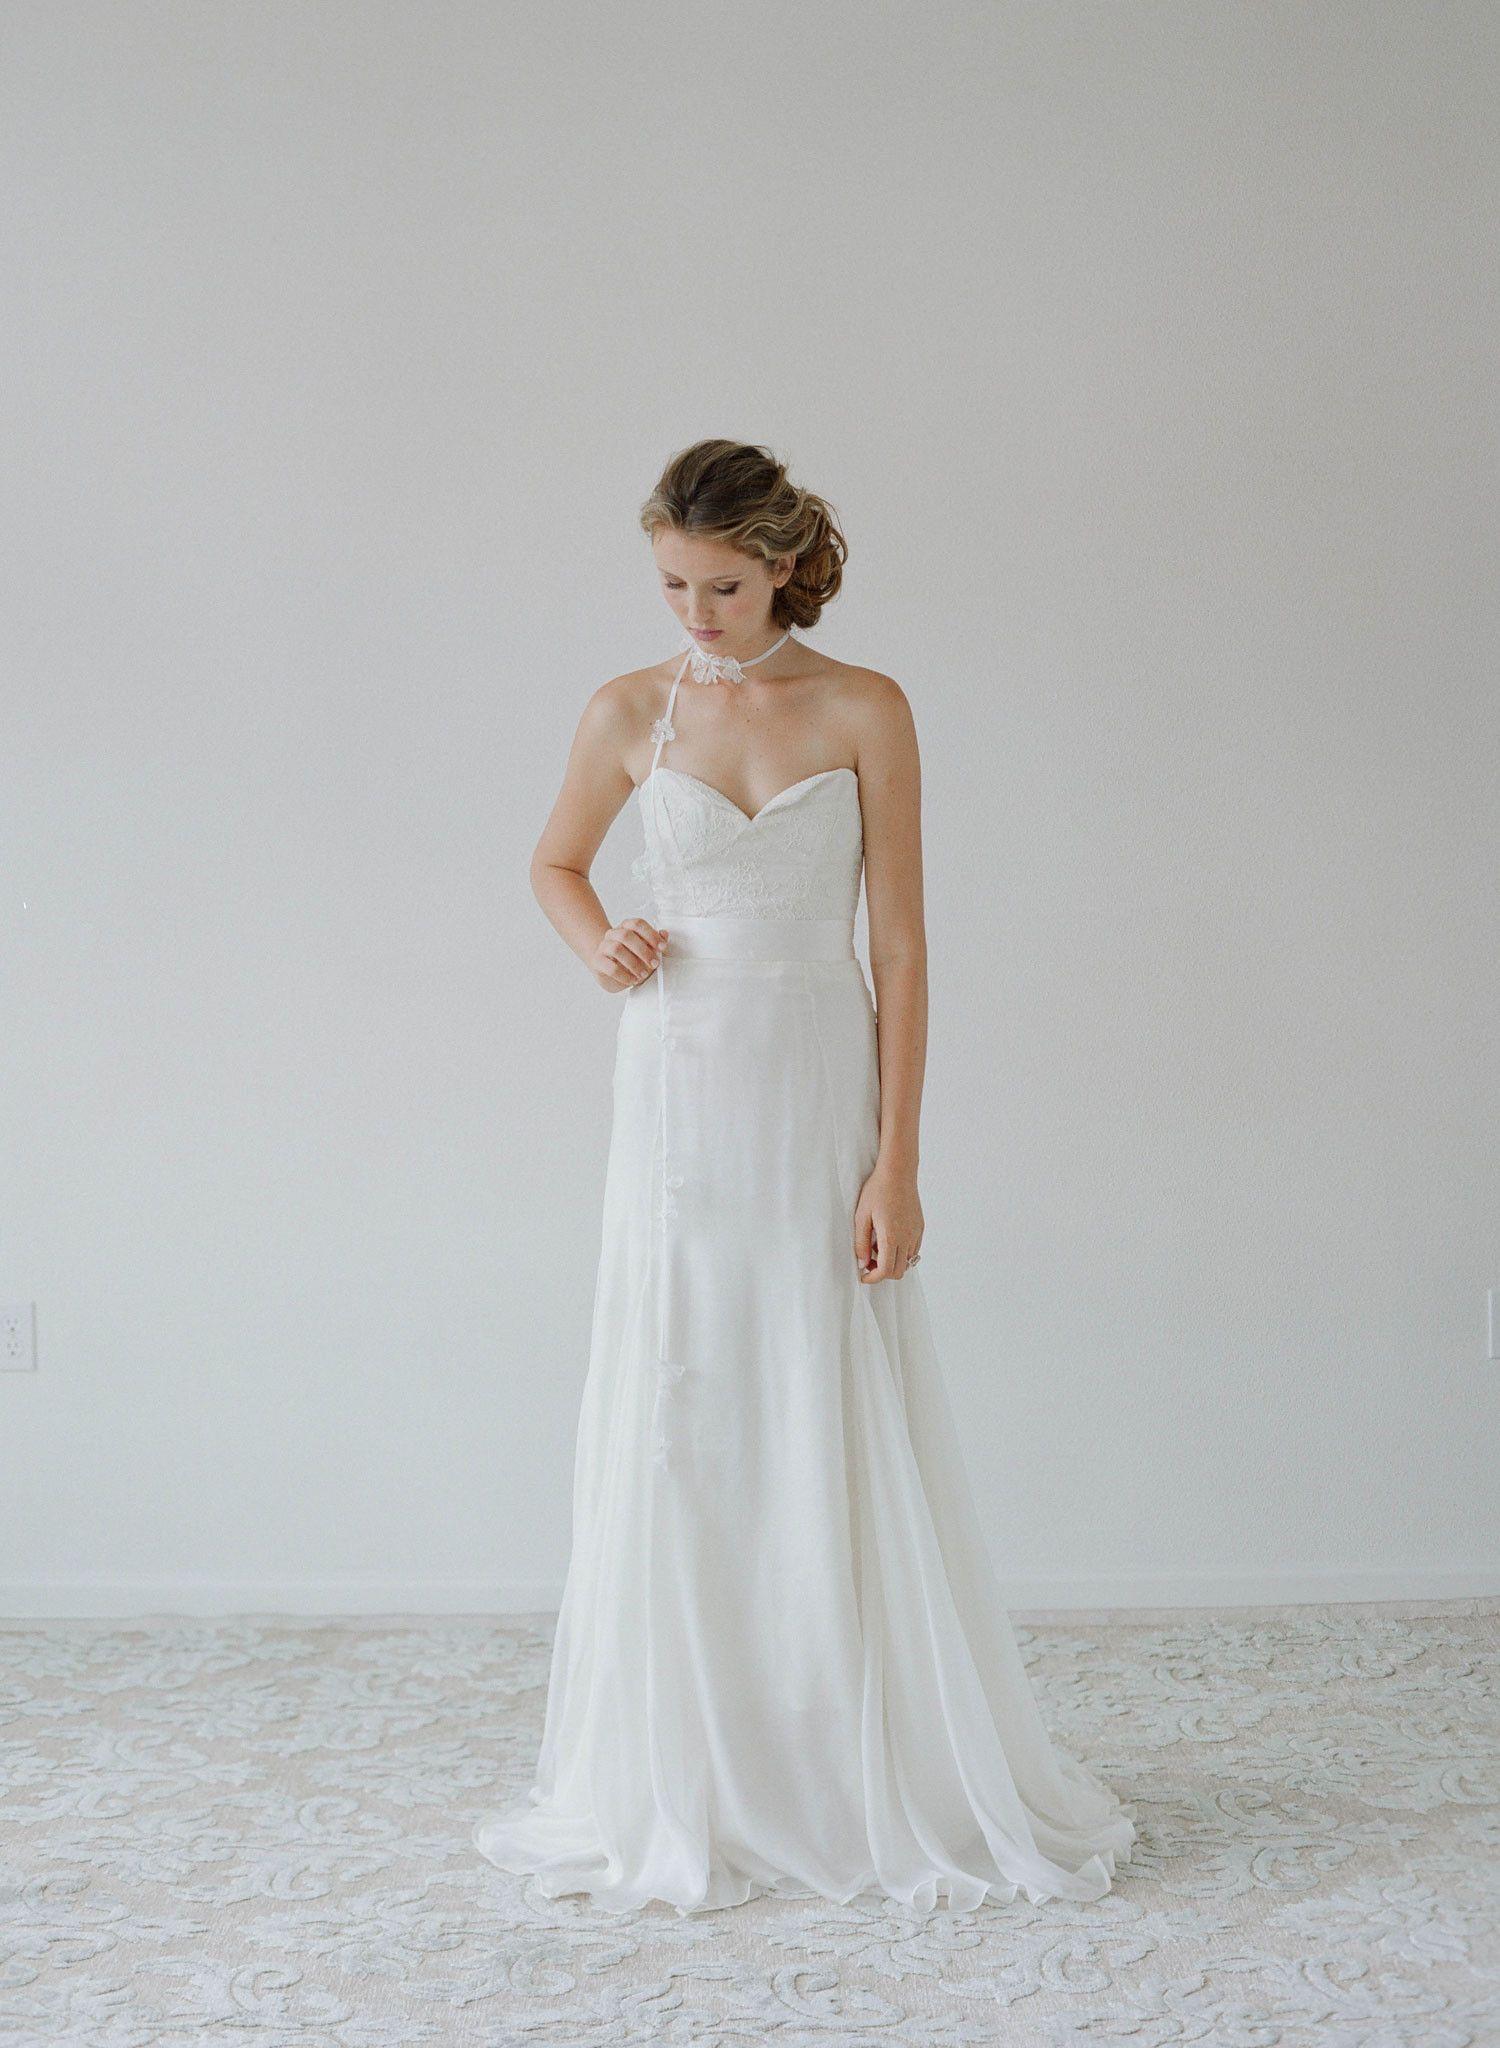 Quail - Lace bustier top - Syle # TH 2123 (2014 myra, bridal attire, myra callan bridal, separates, tops, view all) | Dresses | Twigs & Honey ®, LLC